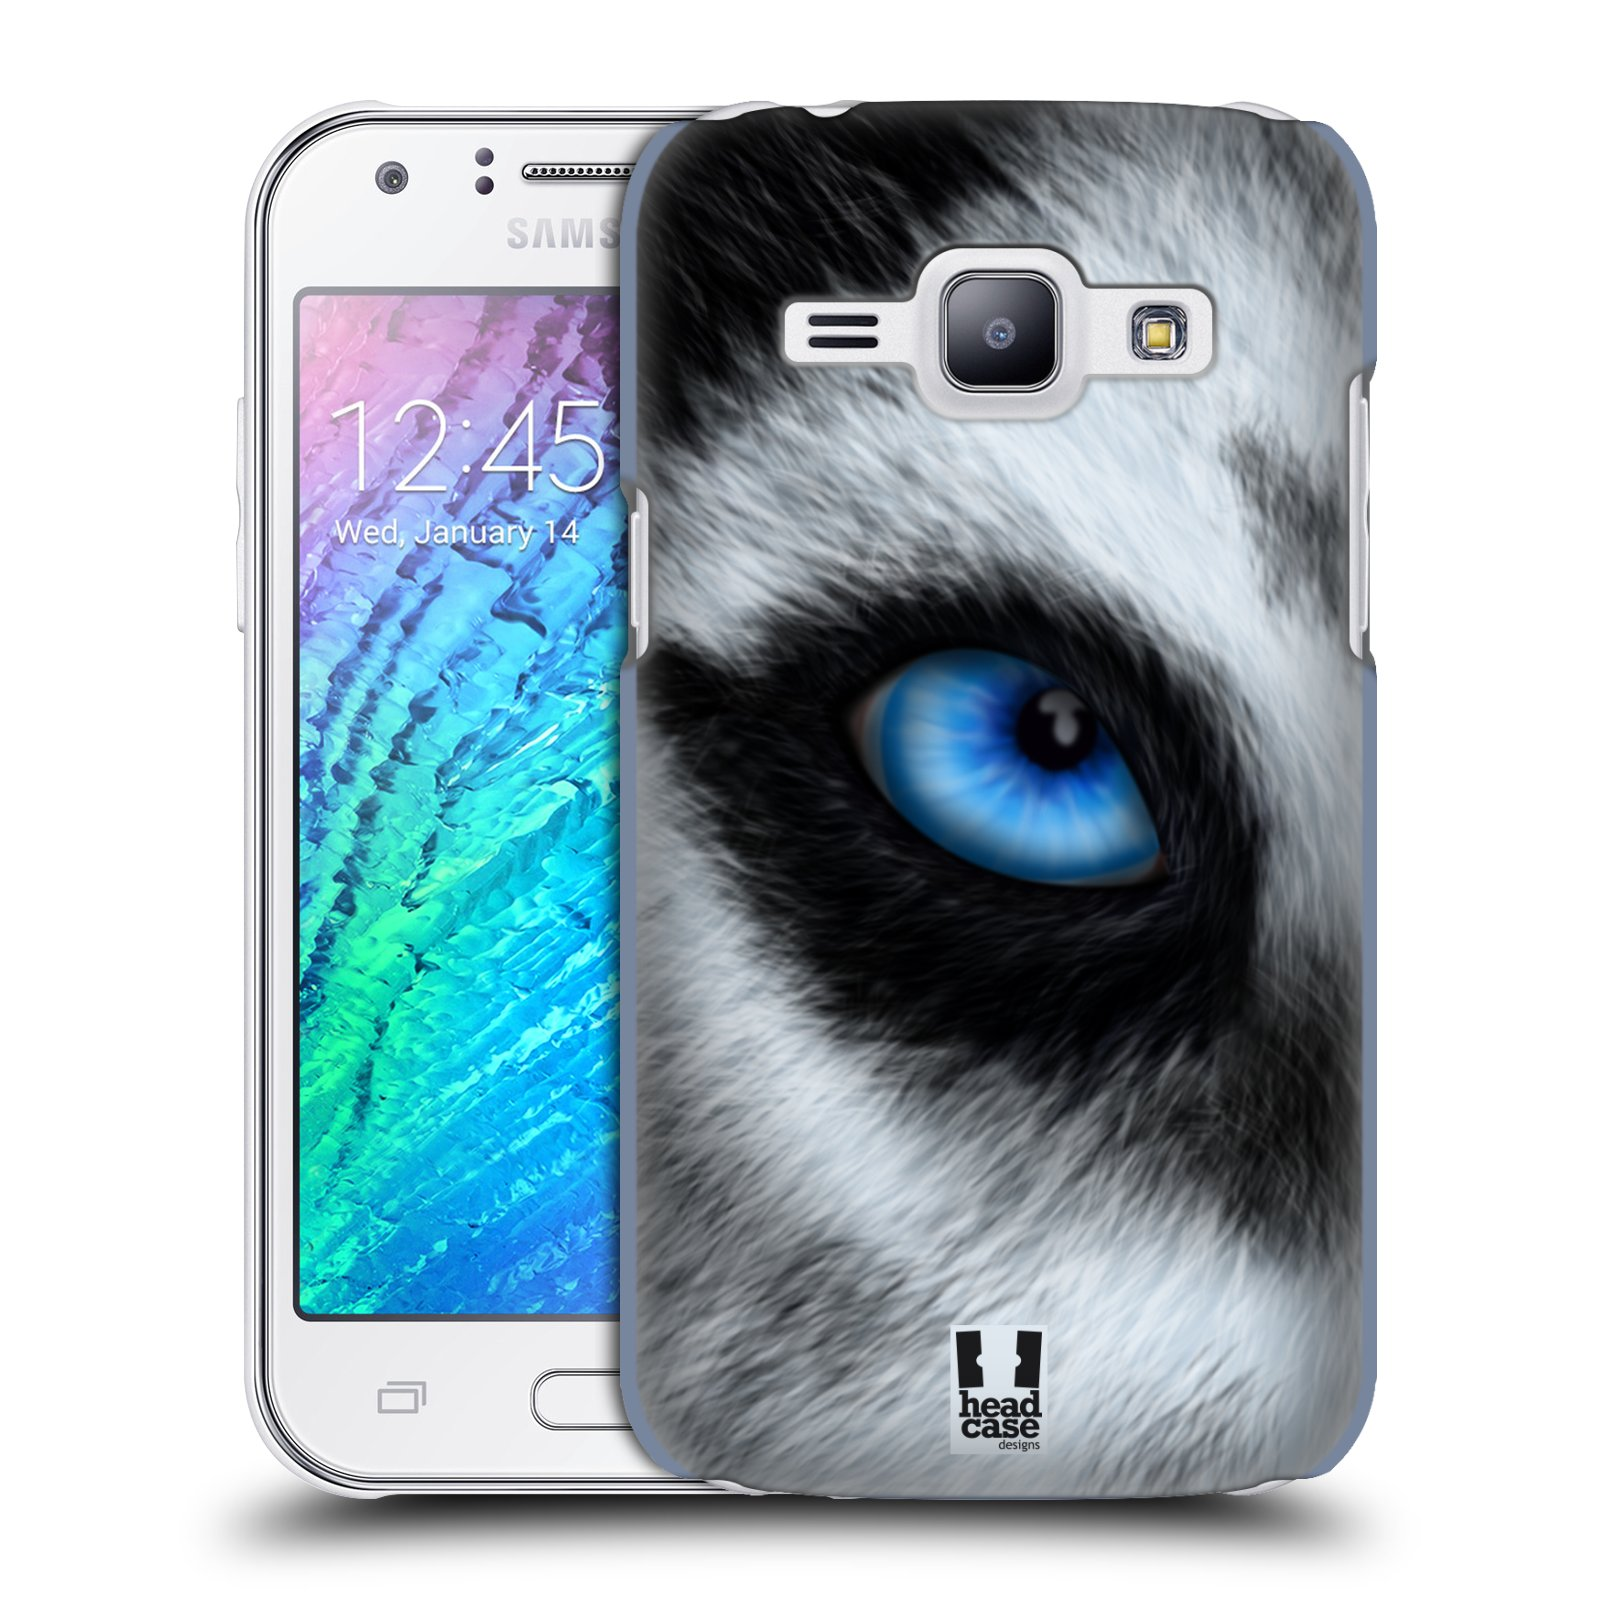 HEAD CASE plastový obal na mobil SAMSUNG Galaxy J1, J100 vzor pohled zvířete oko pes husky